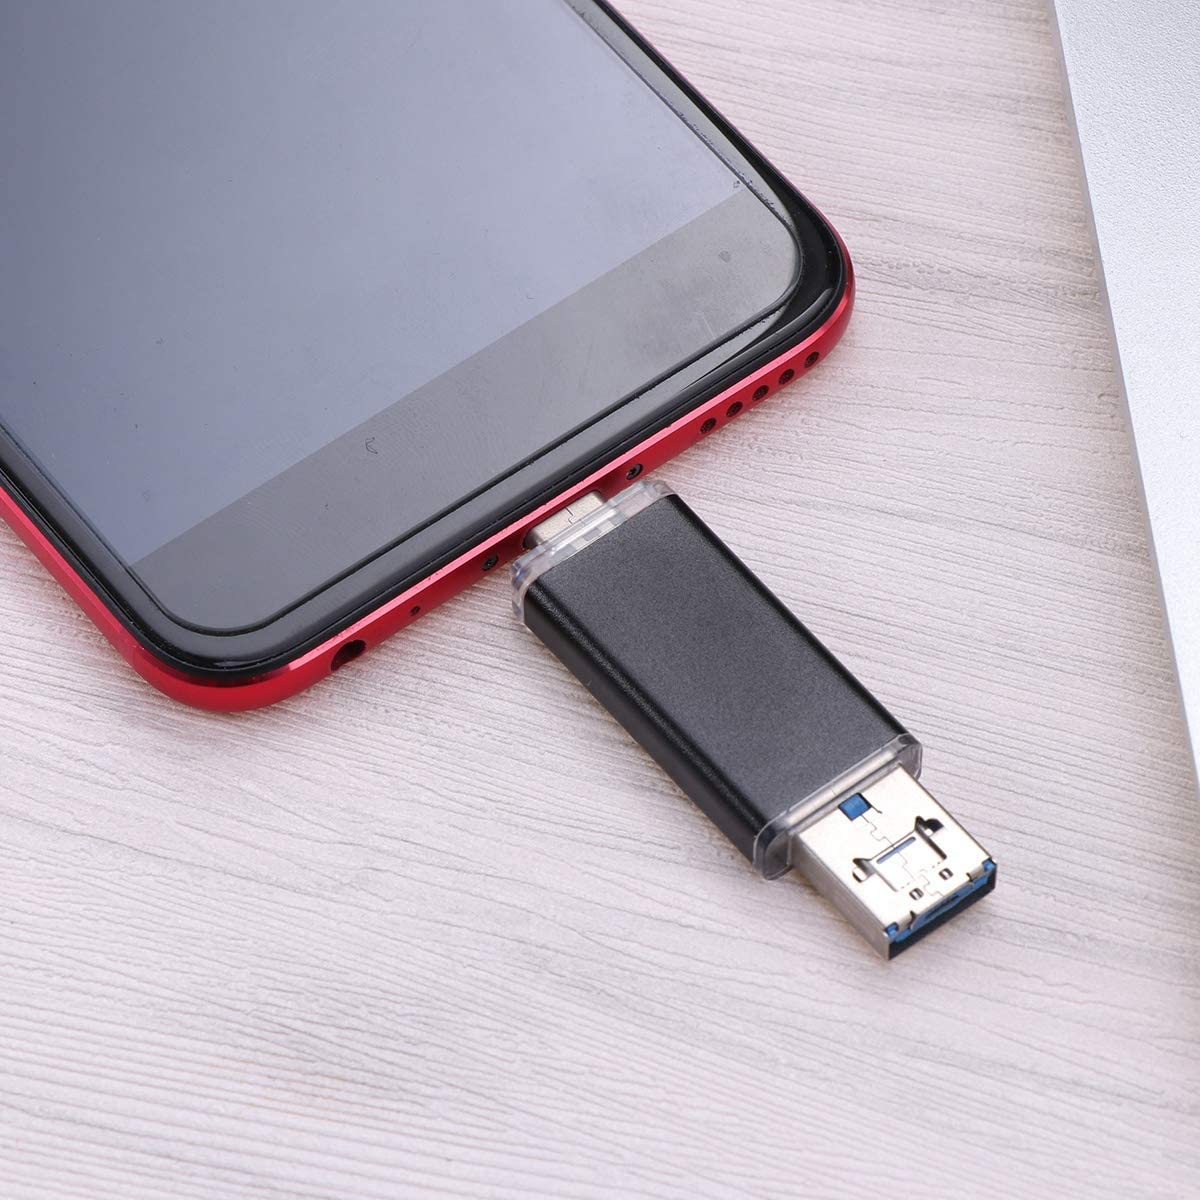 Hemobllo 3 in 1 USB Flash Drive 3.0 Multifunction Connectors Red 32GB